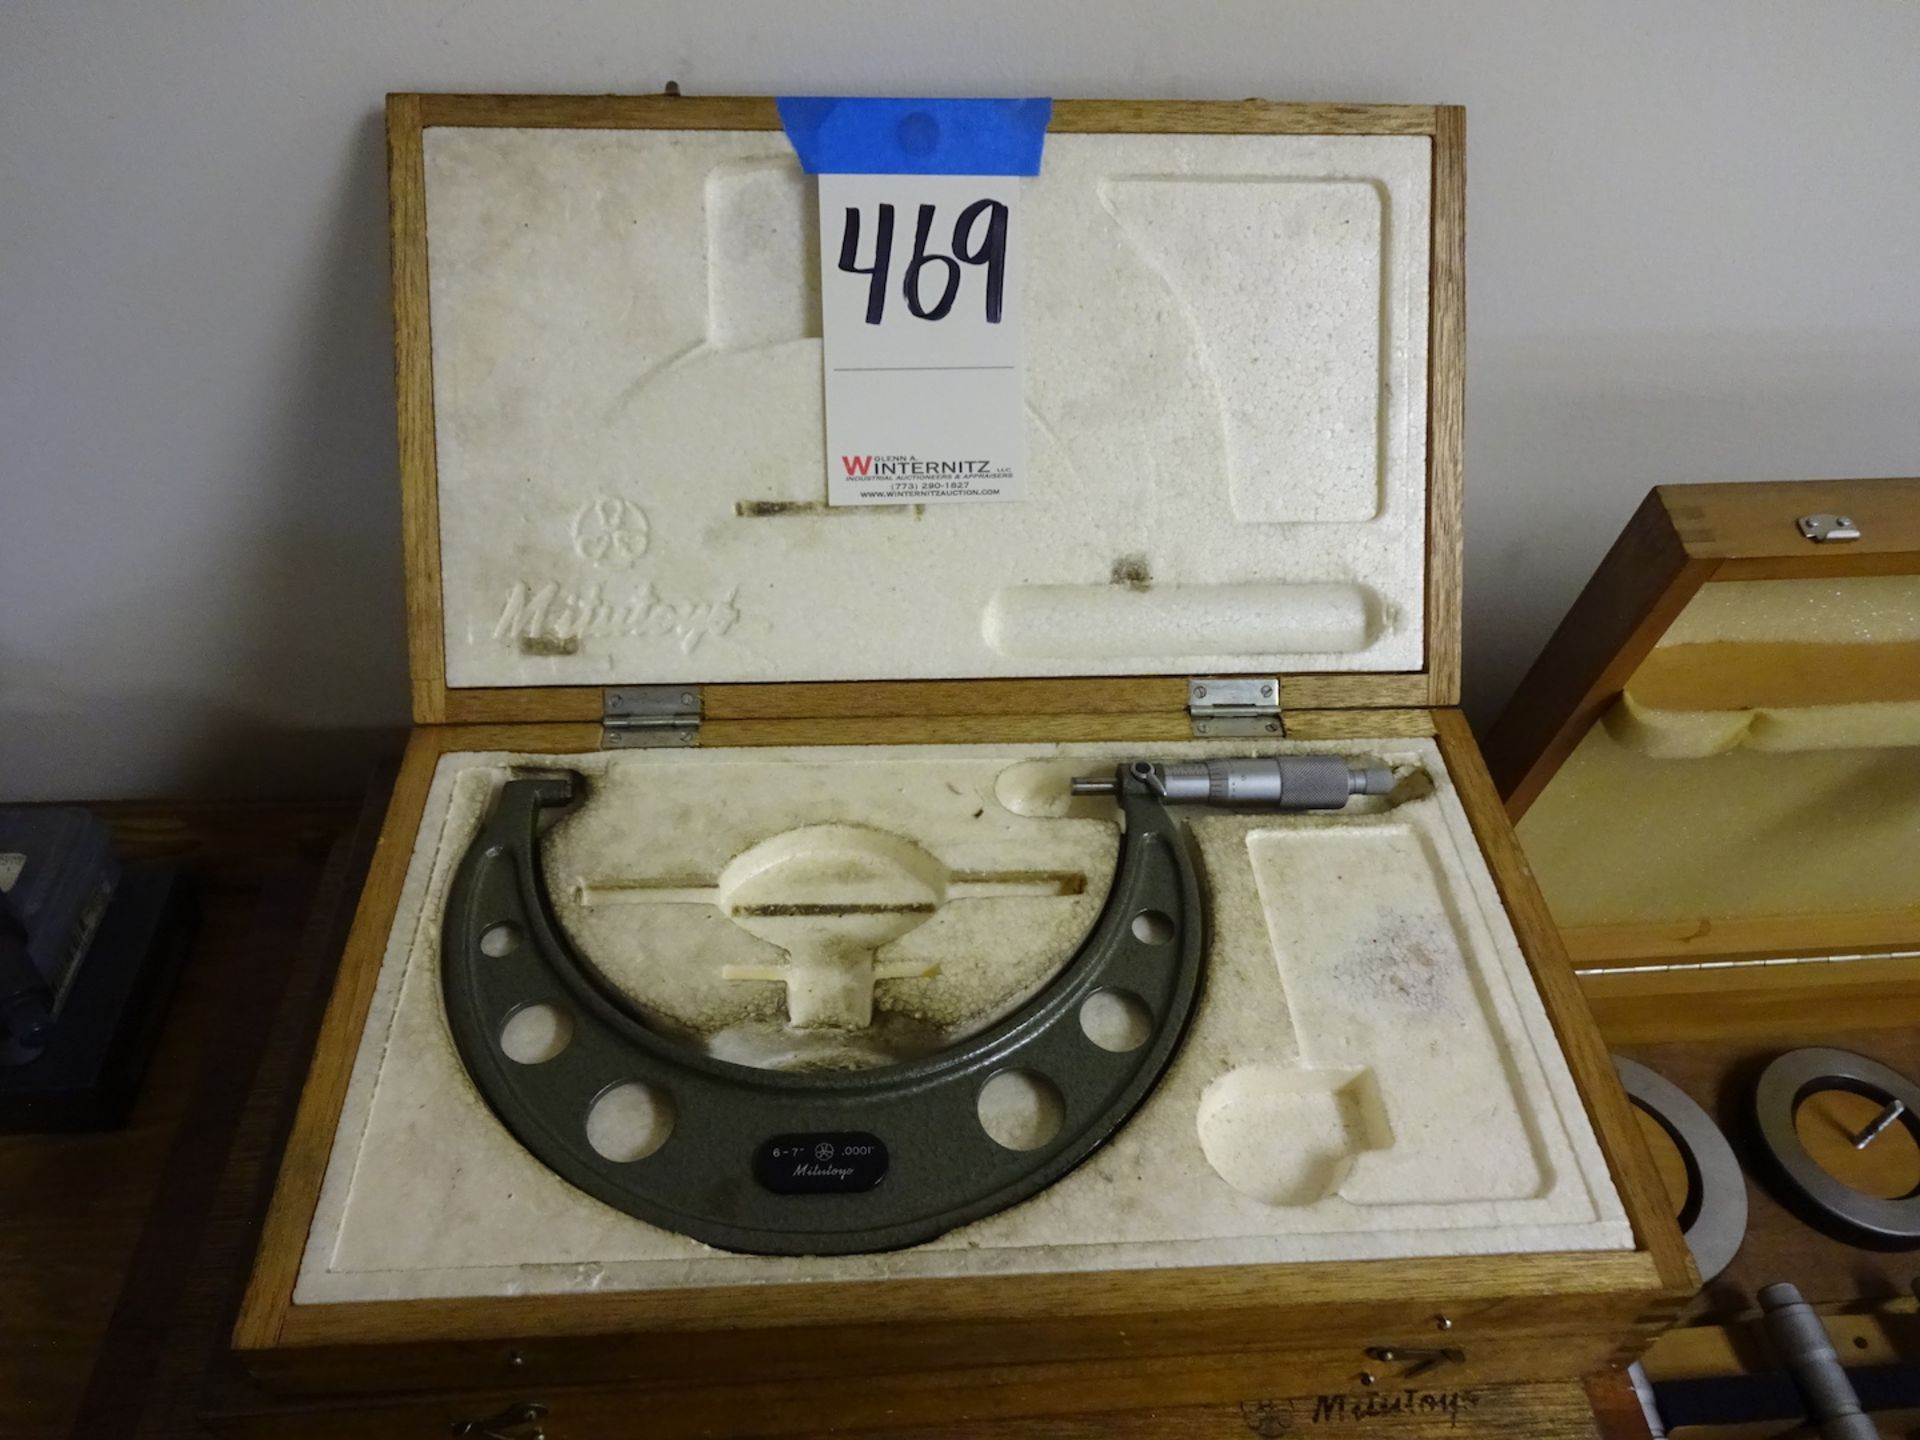 Lot 469 - Mitutoyo 6 in. - 7 in. Micrometer